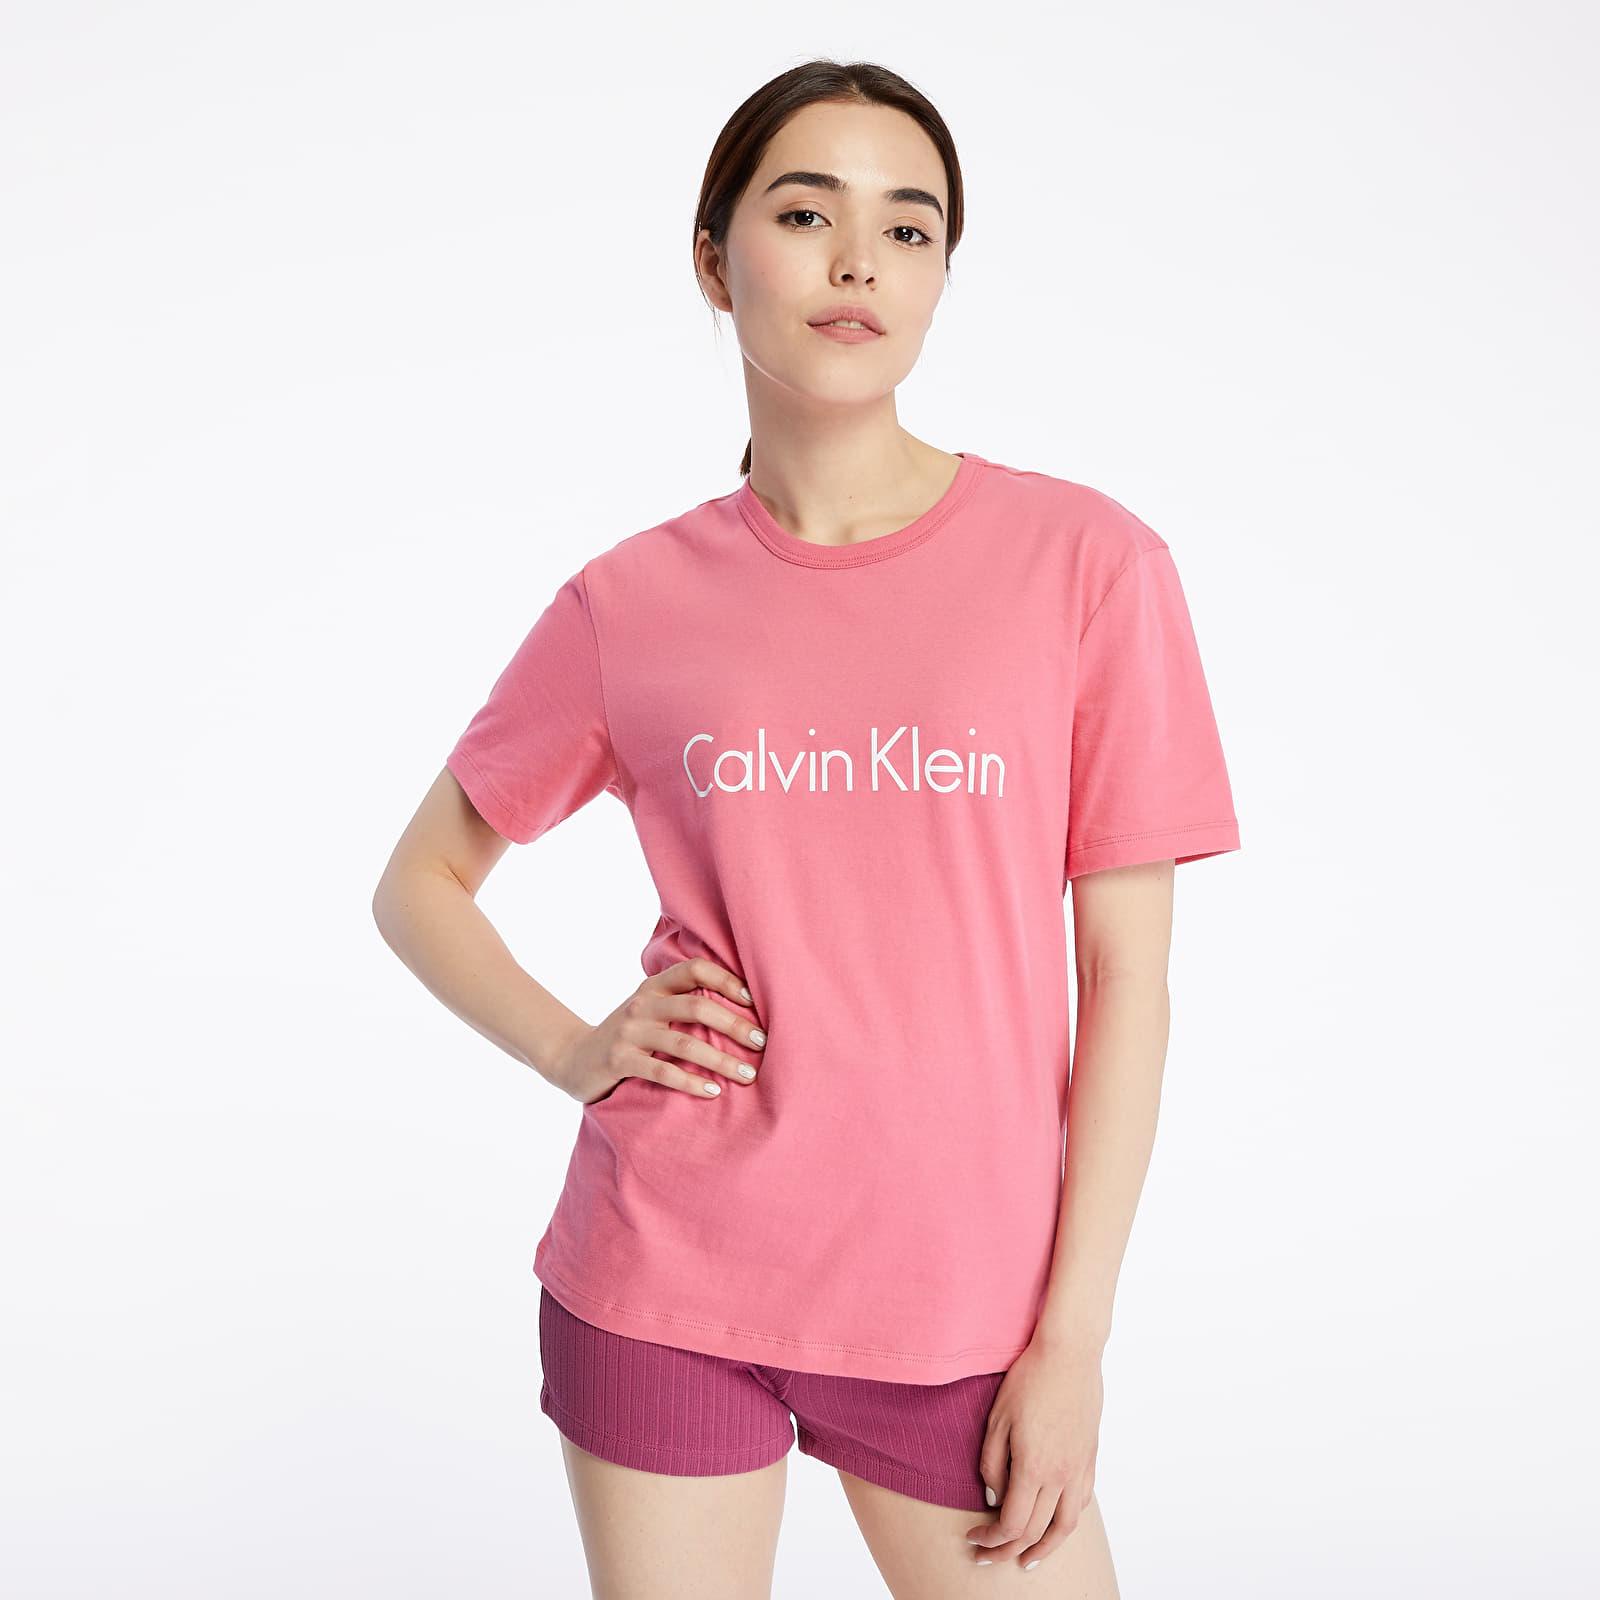 T-shirts Calvin Klein Tee Pink